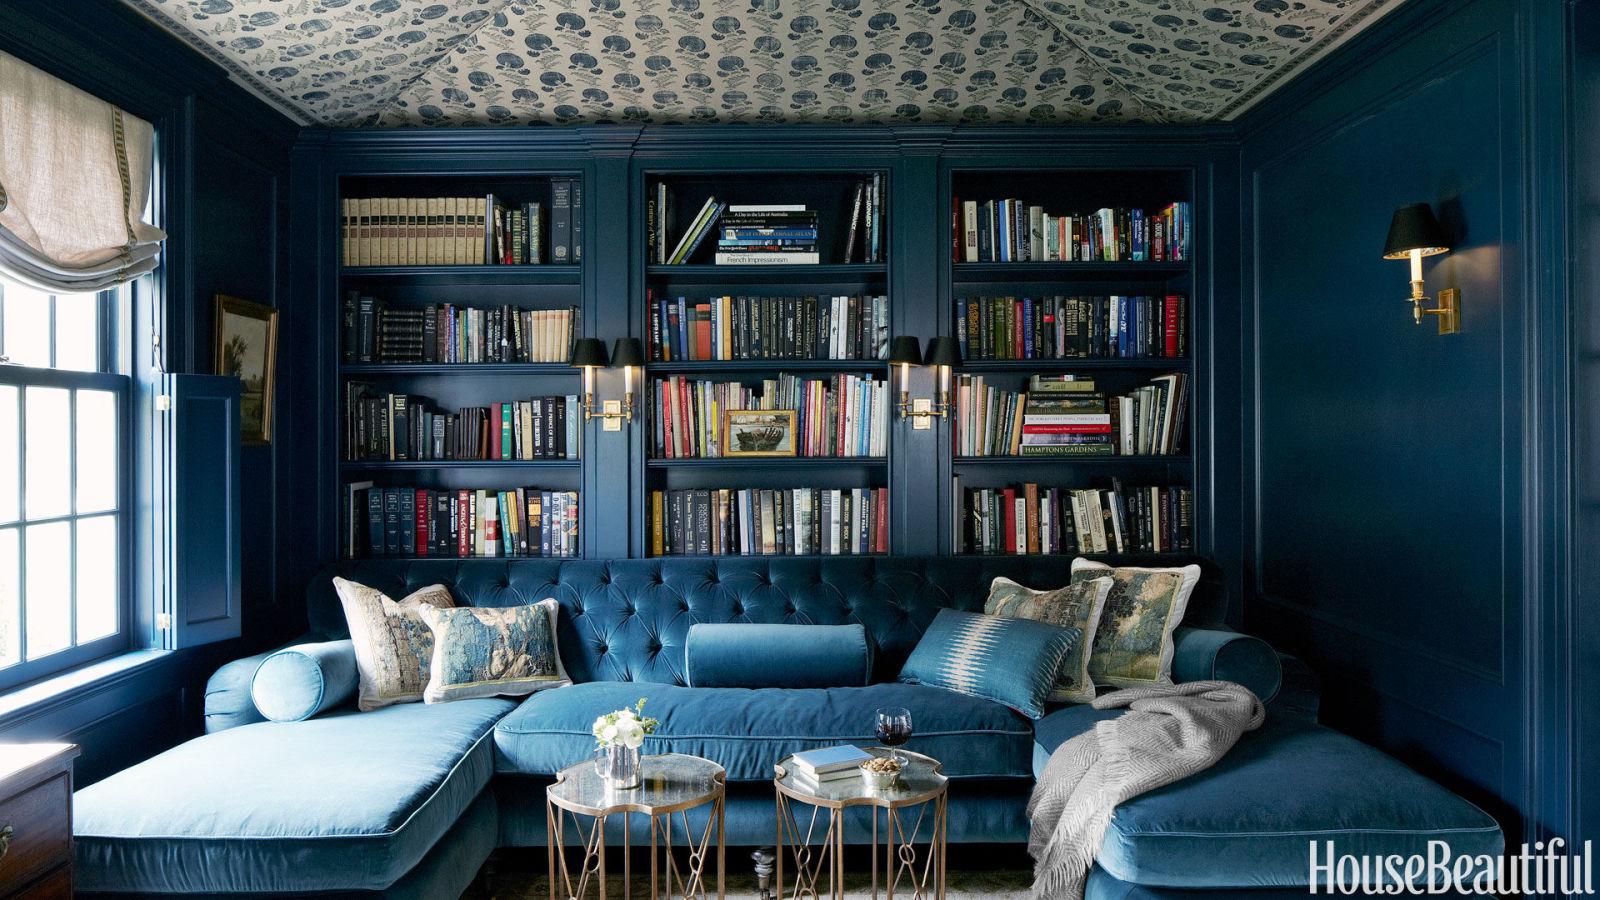 Fantastic Home Library Design Ideas Pictures Of Home Library Decor Largest Home Design Picture Inspirations Pitcheantrous